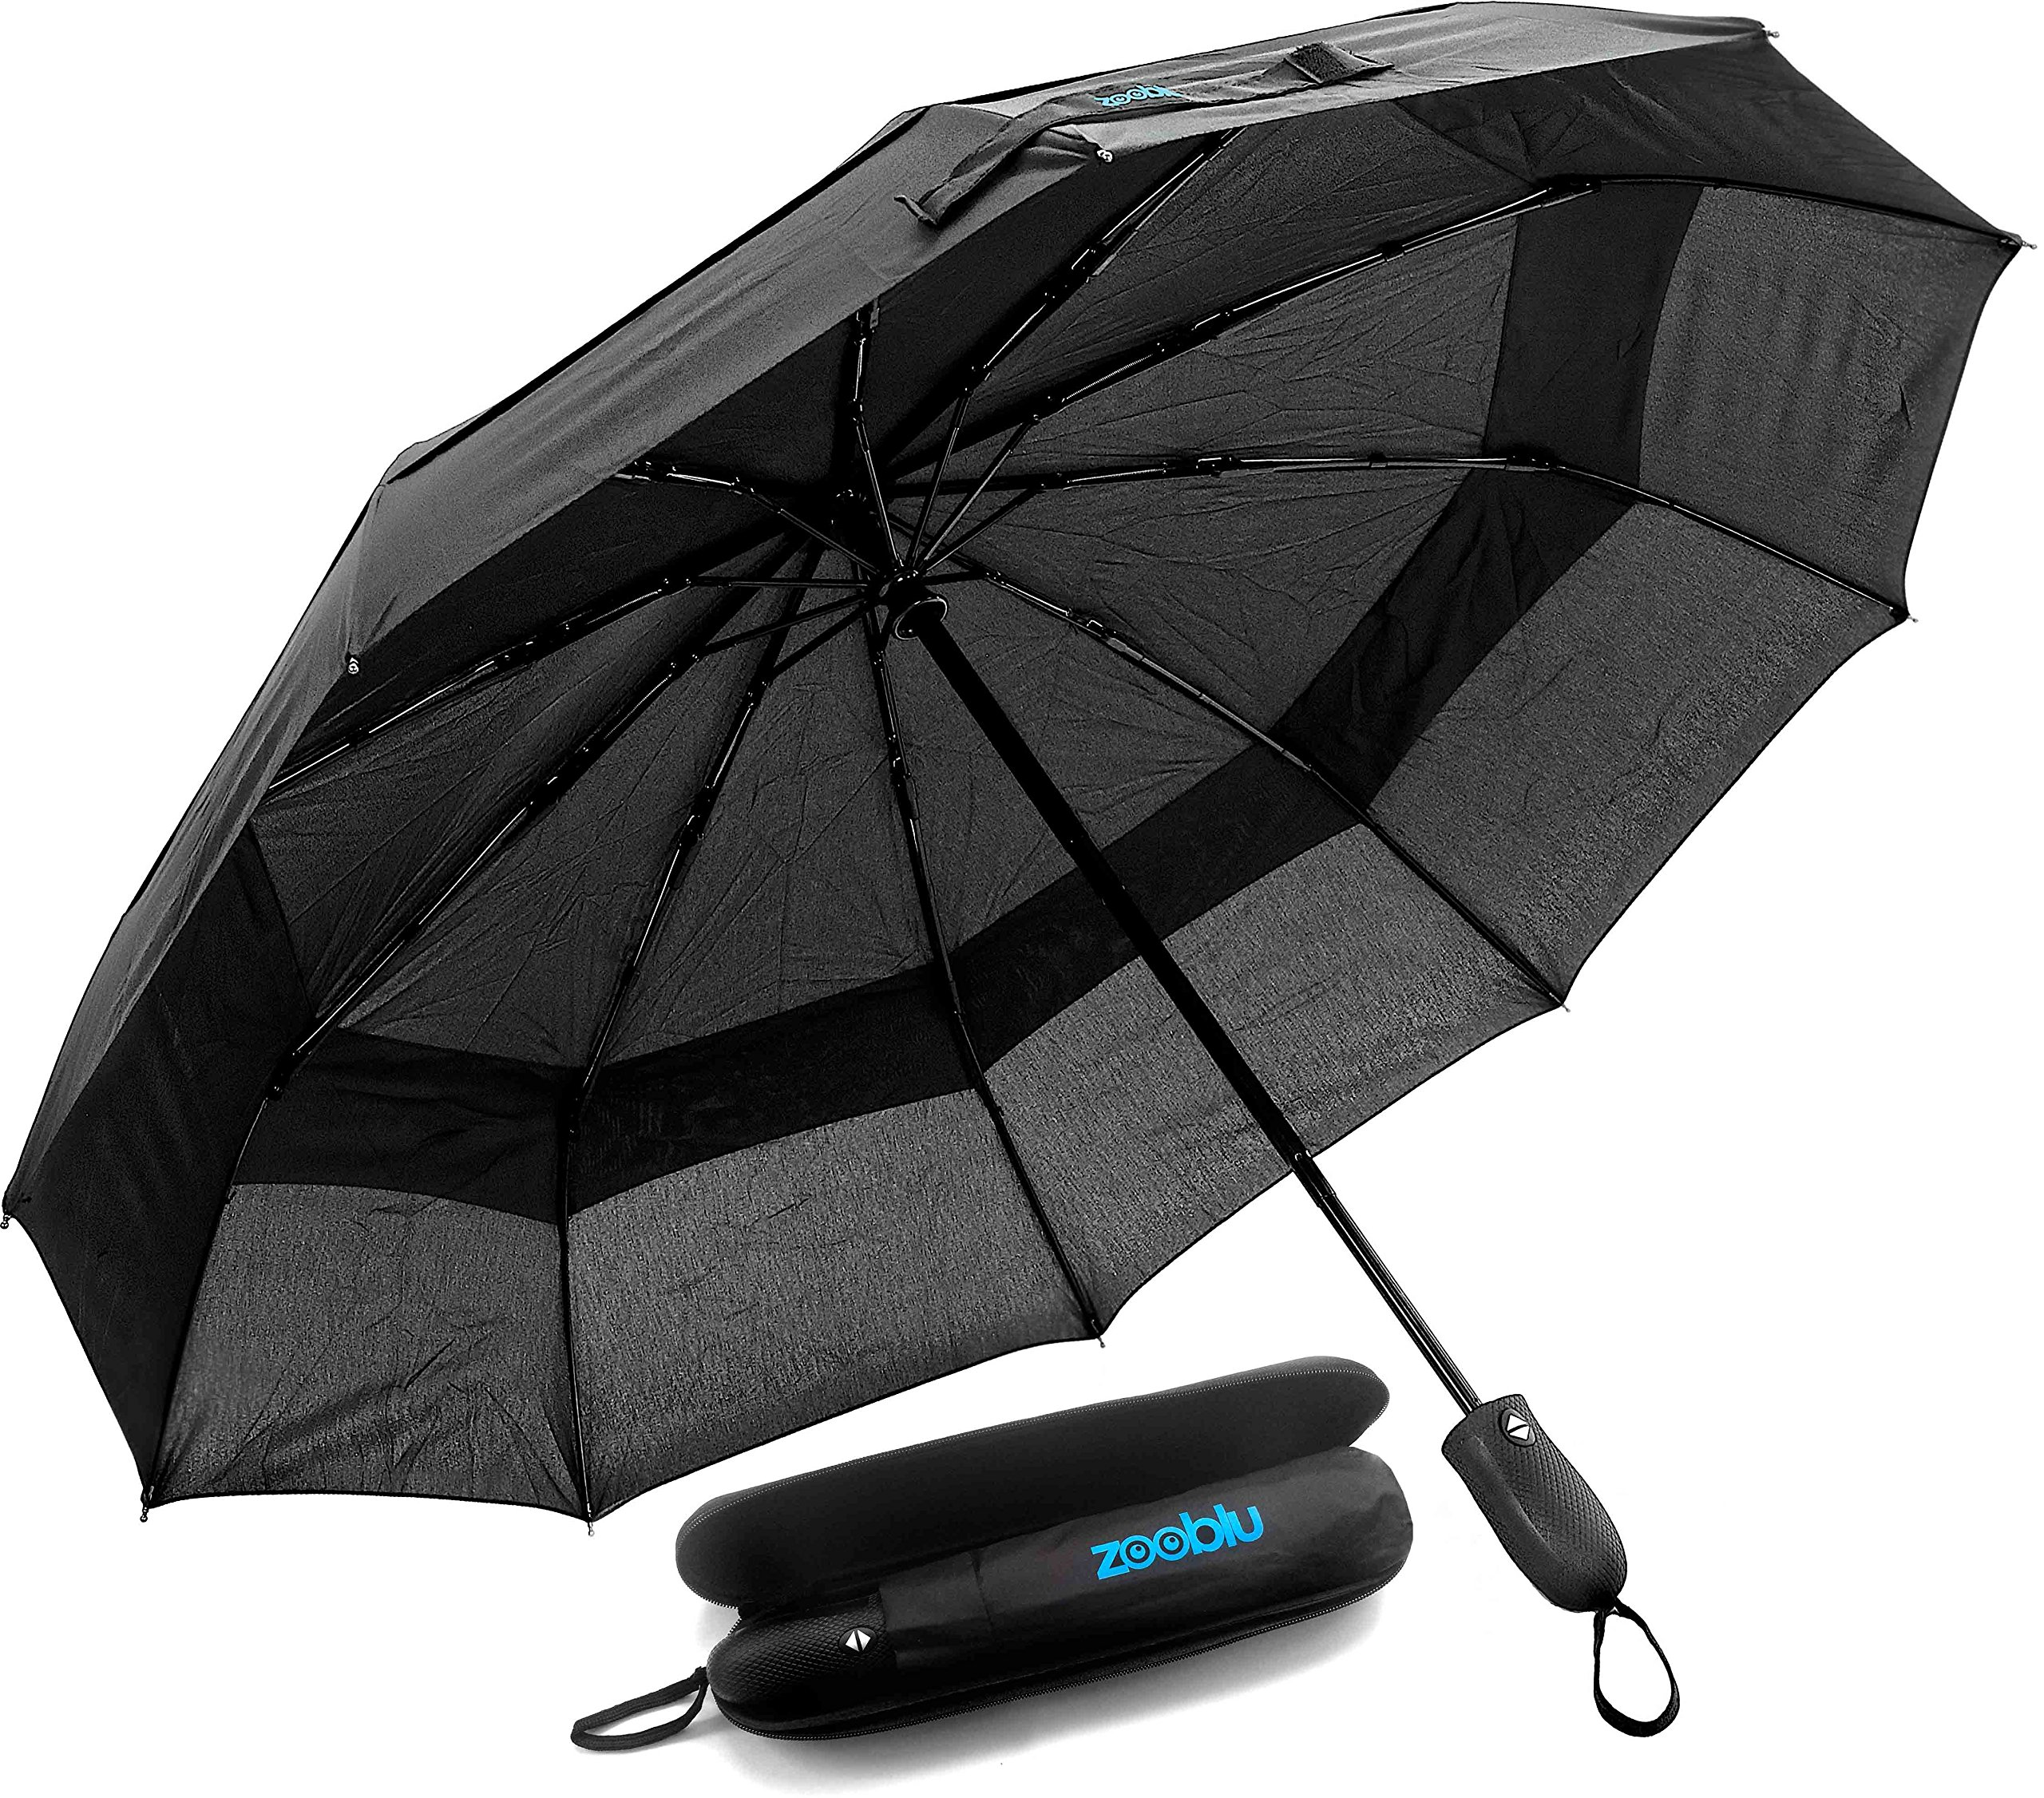 Zooblu WindFarer - Heavy Duty Windproof Travel Umbrella with Case - Auto Open and Close